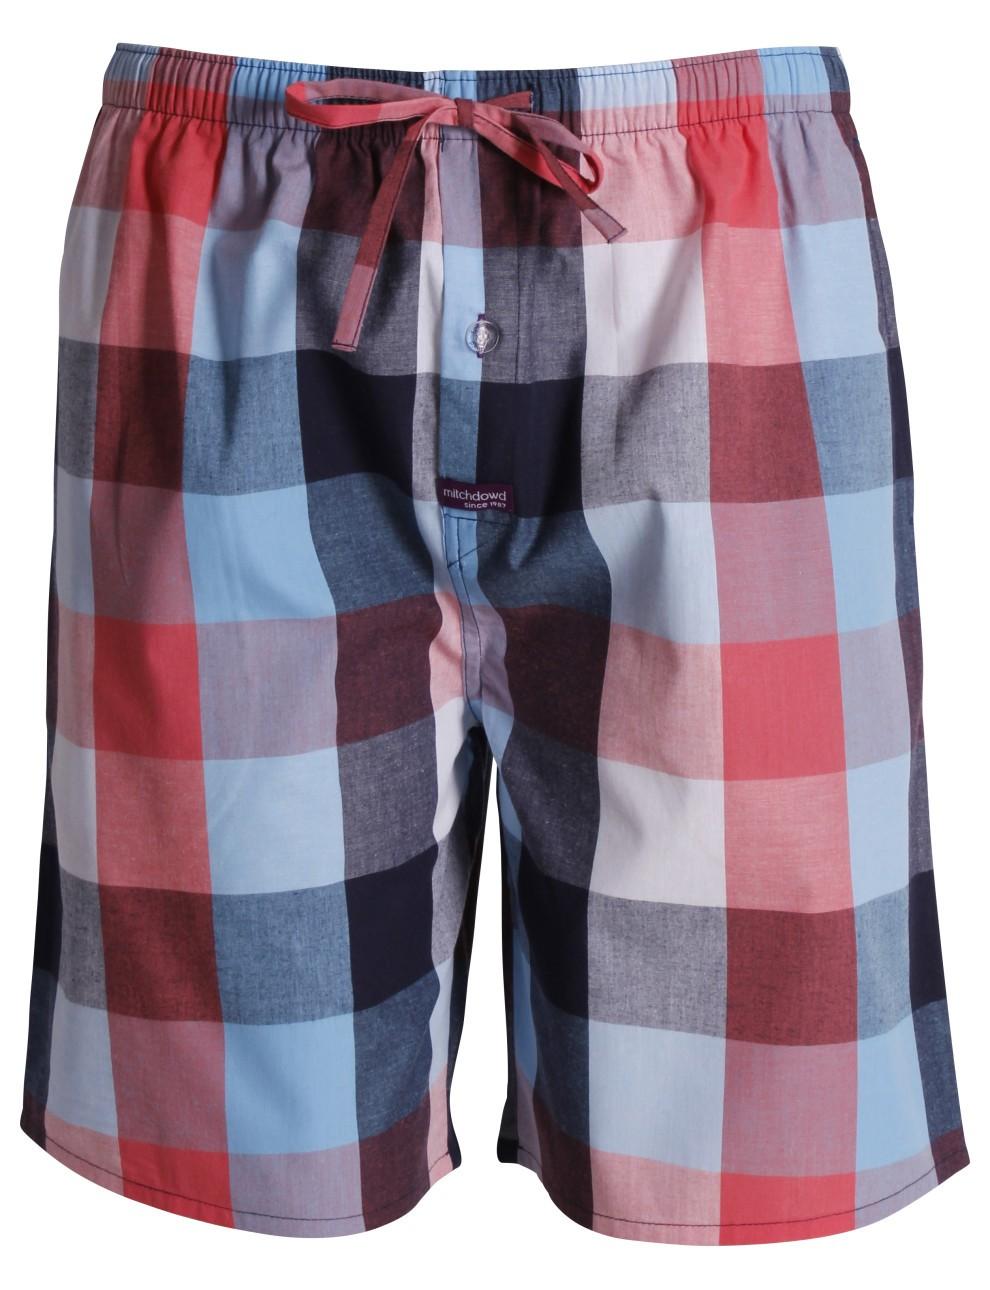 Multicolored checkered Sleep Short Nightwear